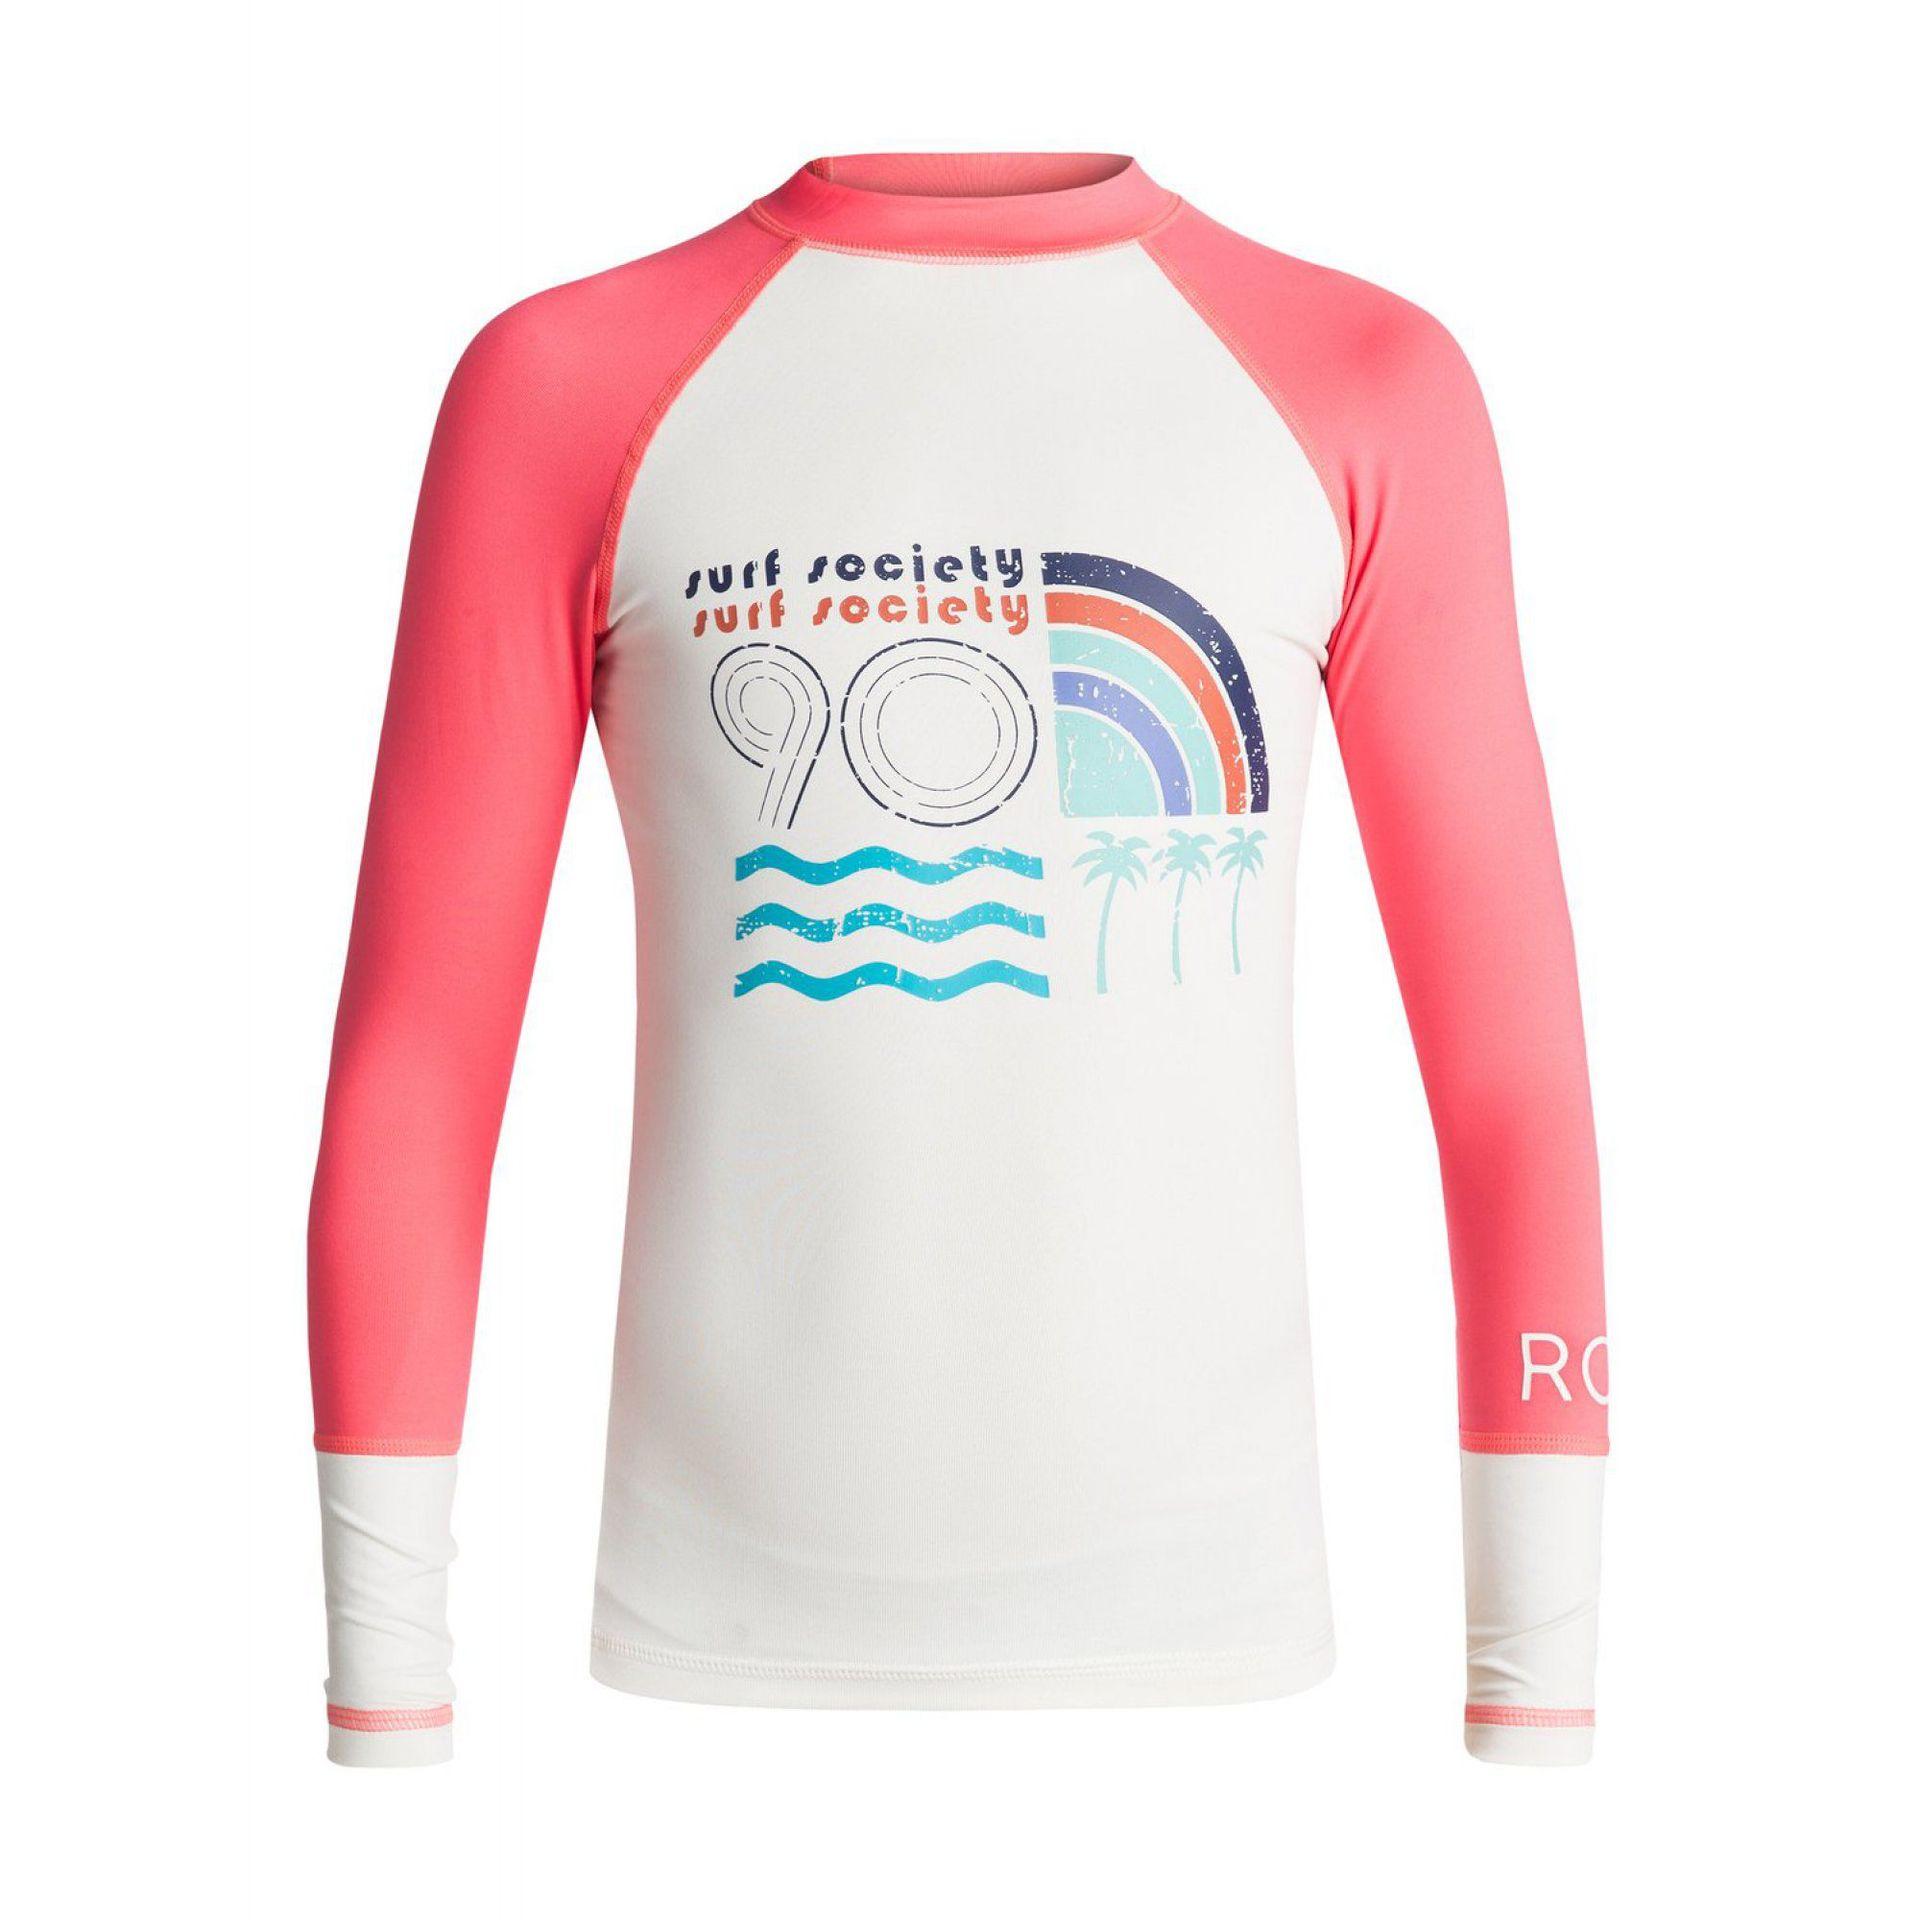 LYCRA ROXY GIRLS 7-14 SEA BOUND LS MARSHMELLOW